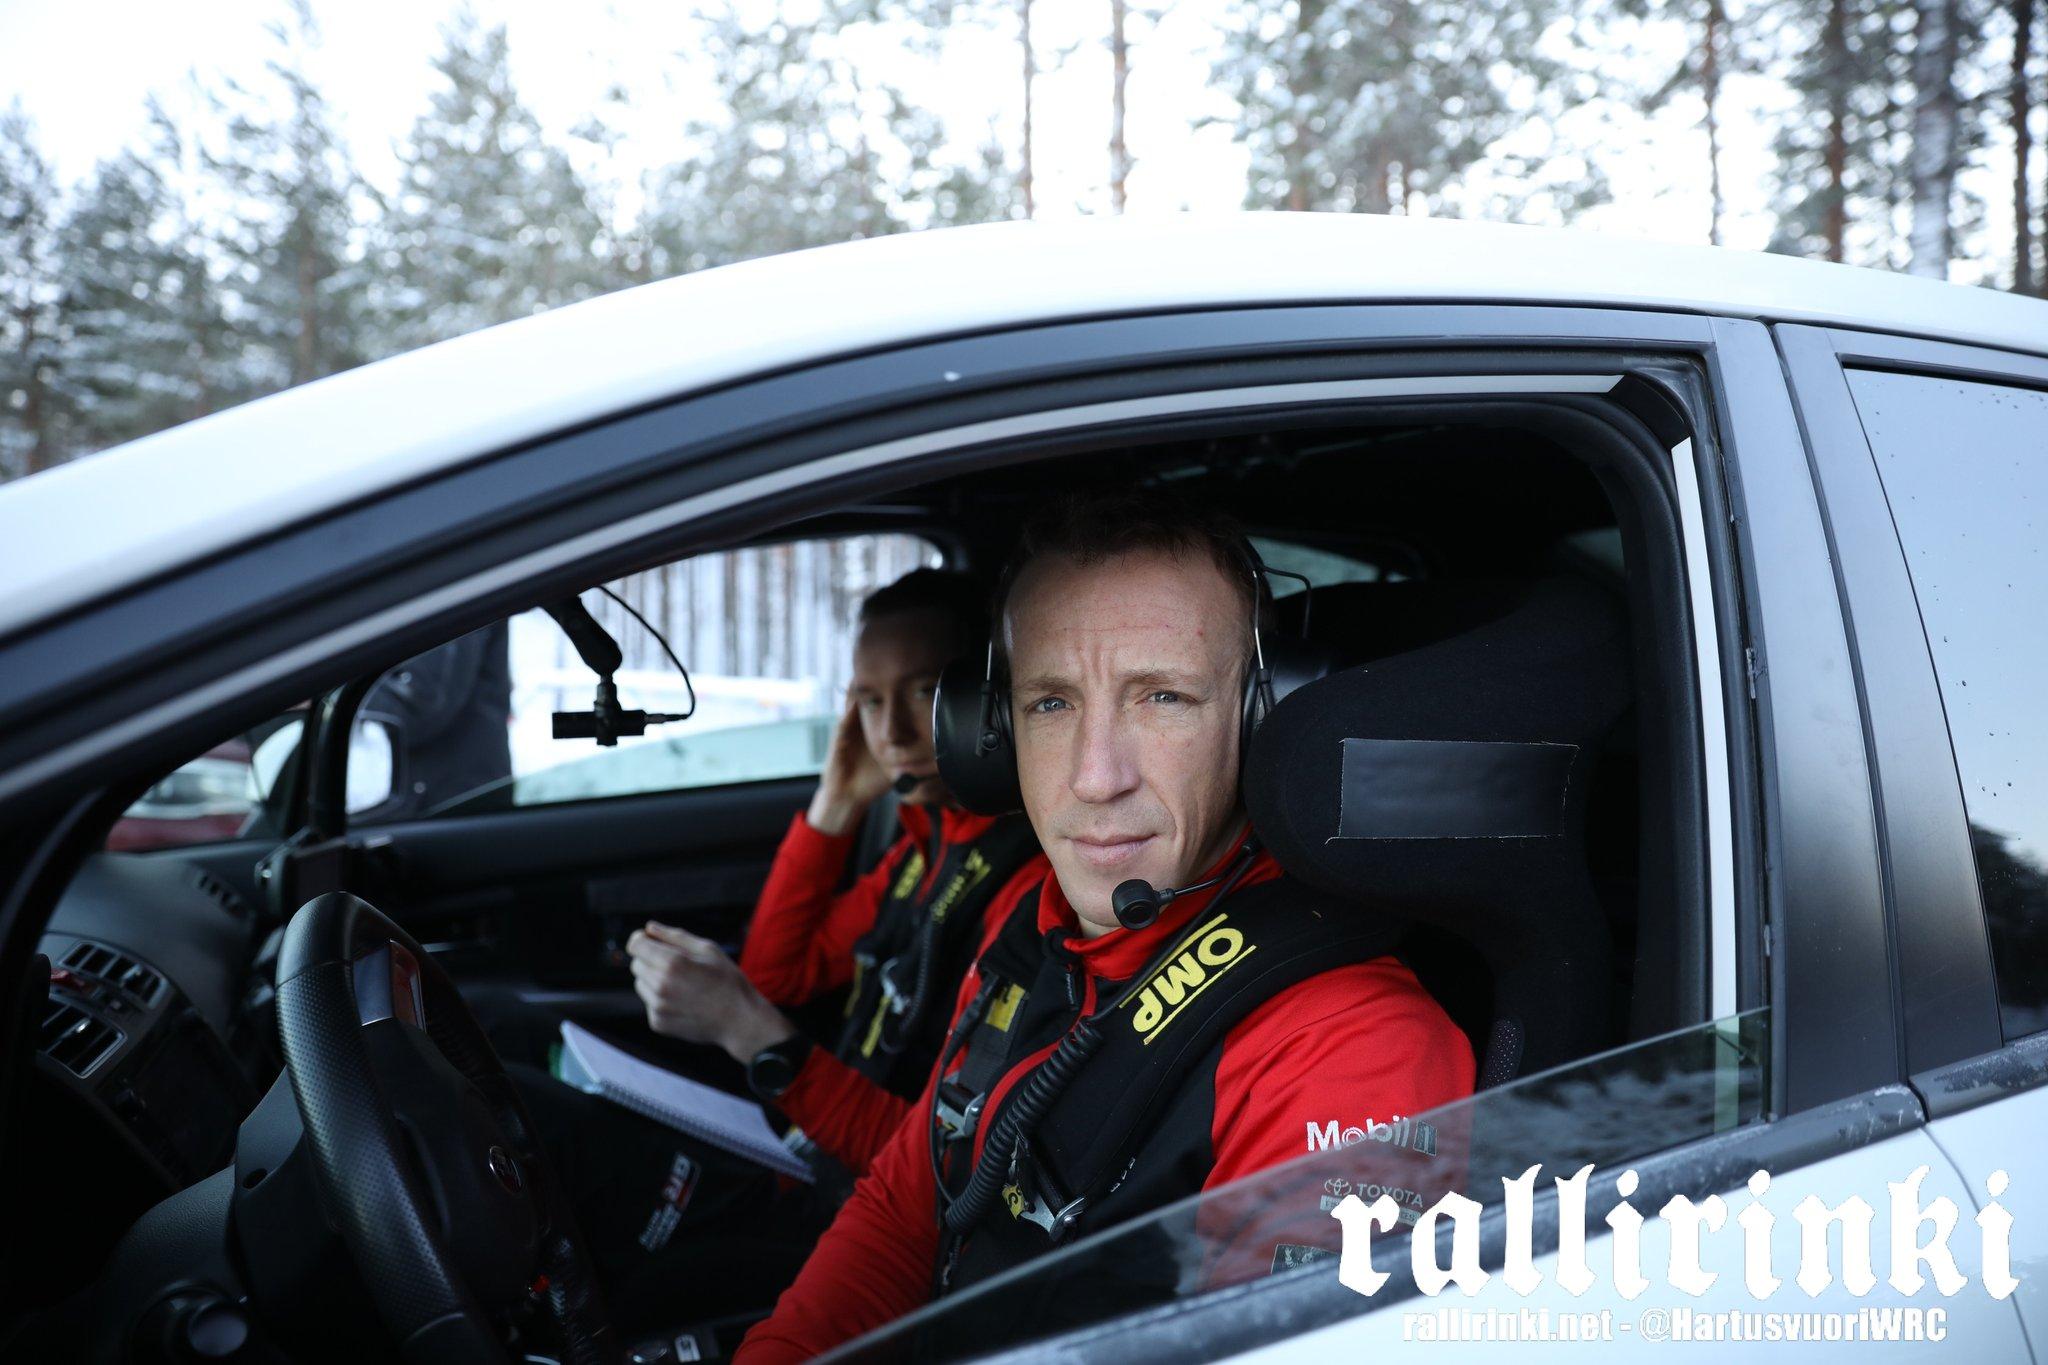 WRC: 67º Rallye Sweden [14-17 Febrero] - Página 2 DzMPB4LWwAAeVDL